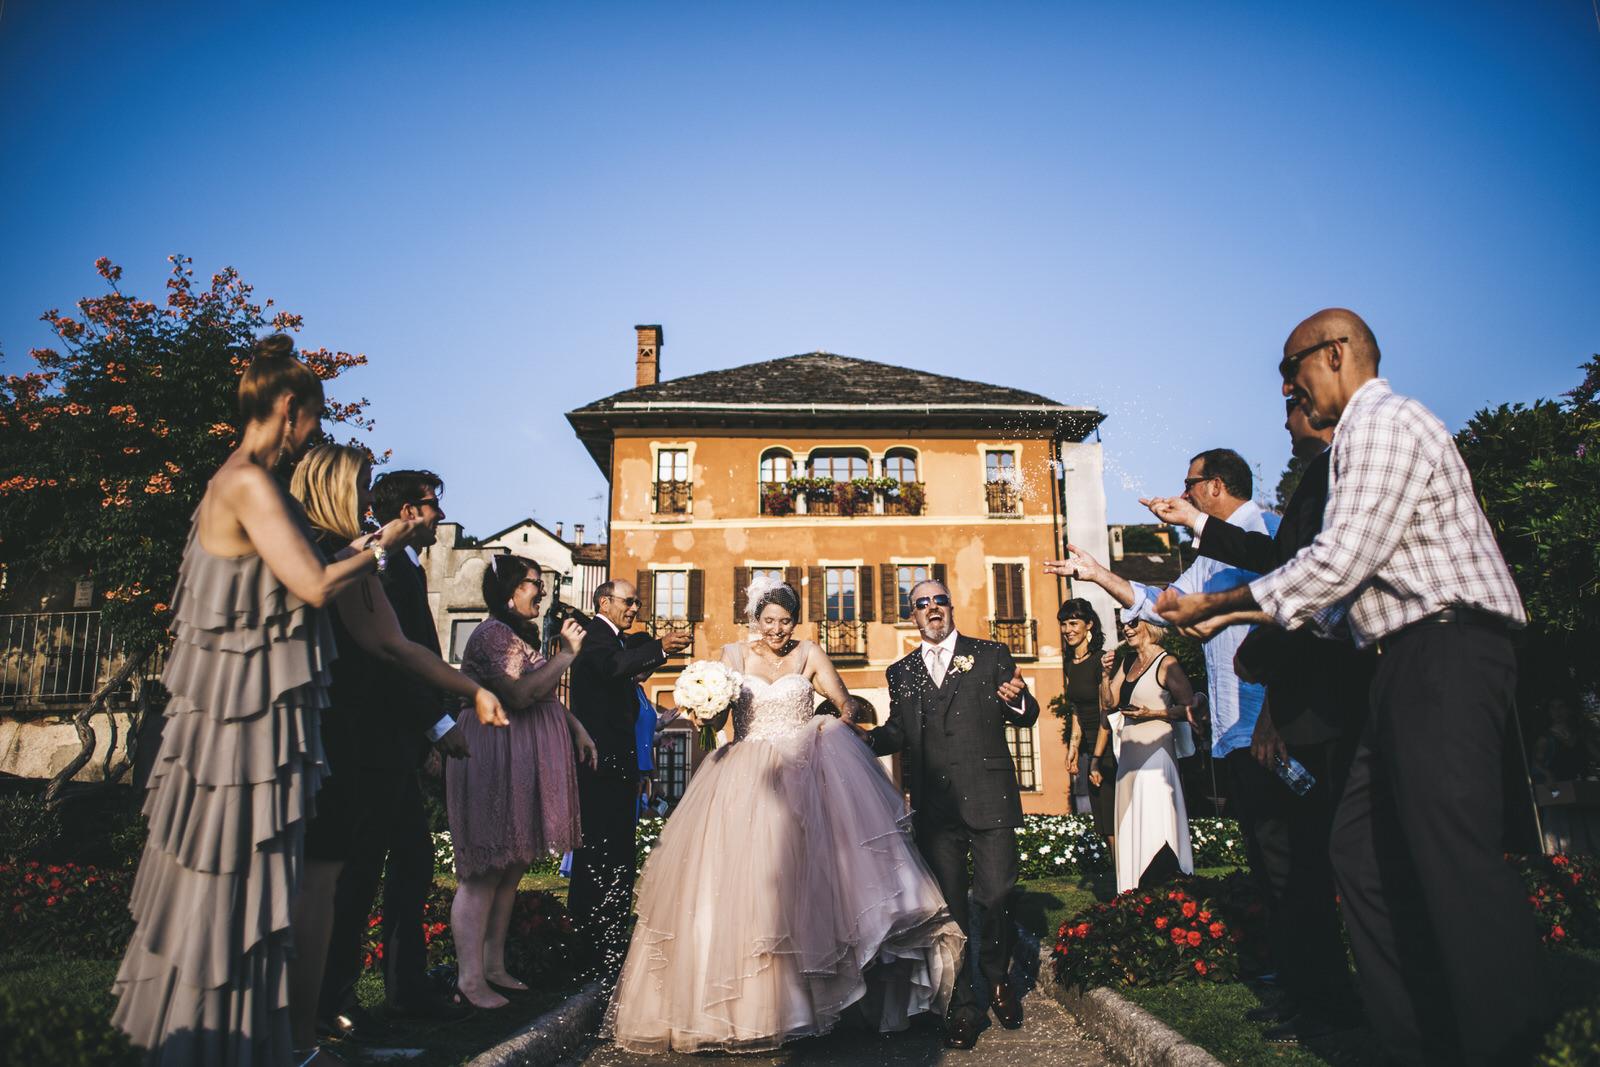 wedding photographer in italy-venice-tuscany-florence-amalfi coast-como lake-villa del balbianello-siena-amalfi-ravello-belmond-villa cimbrone30